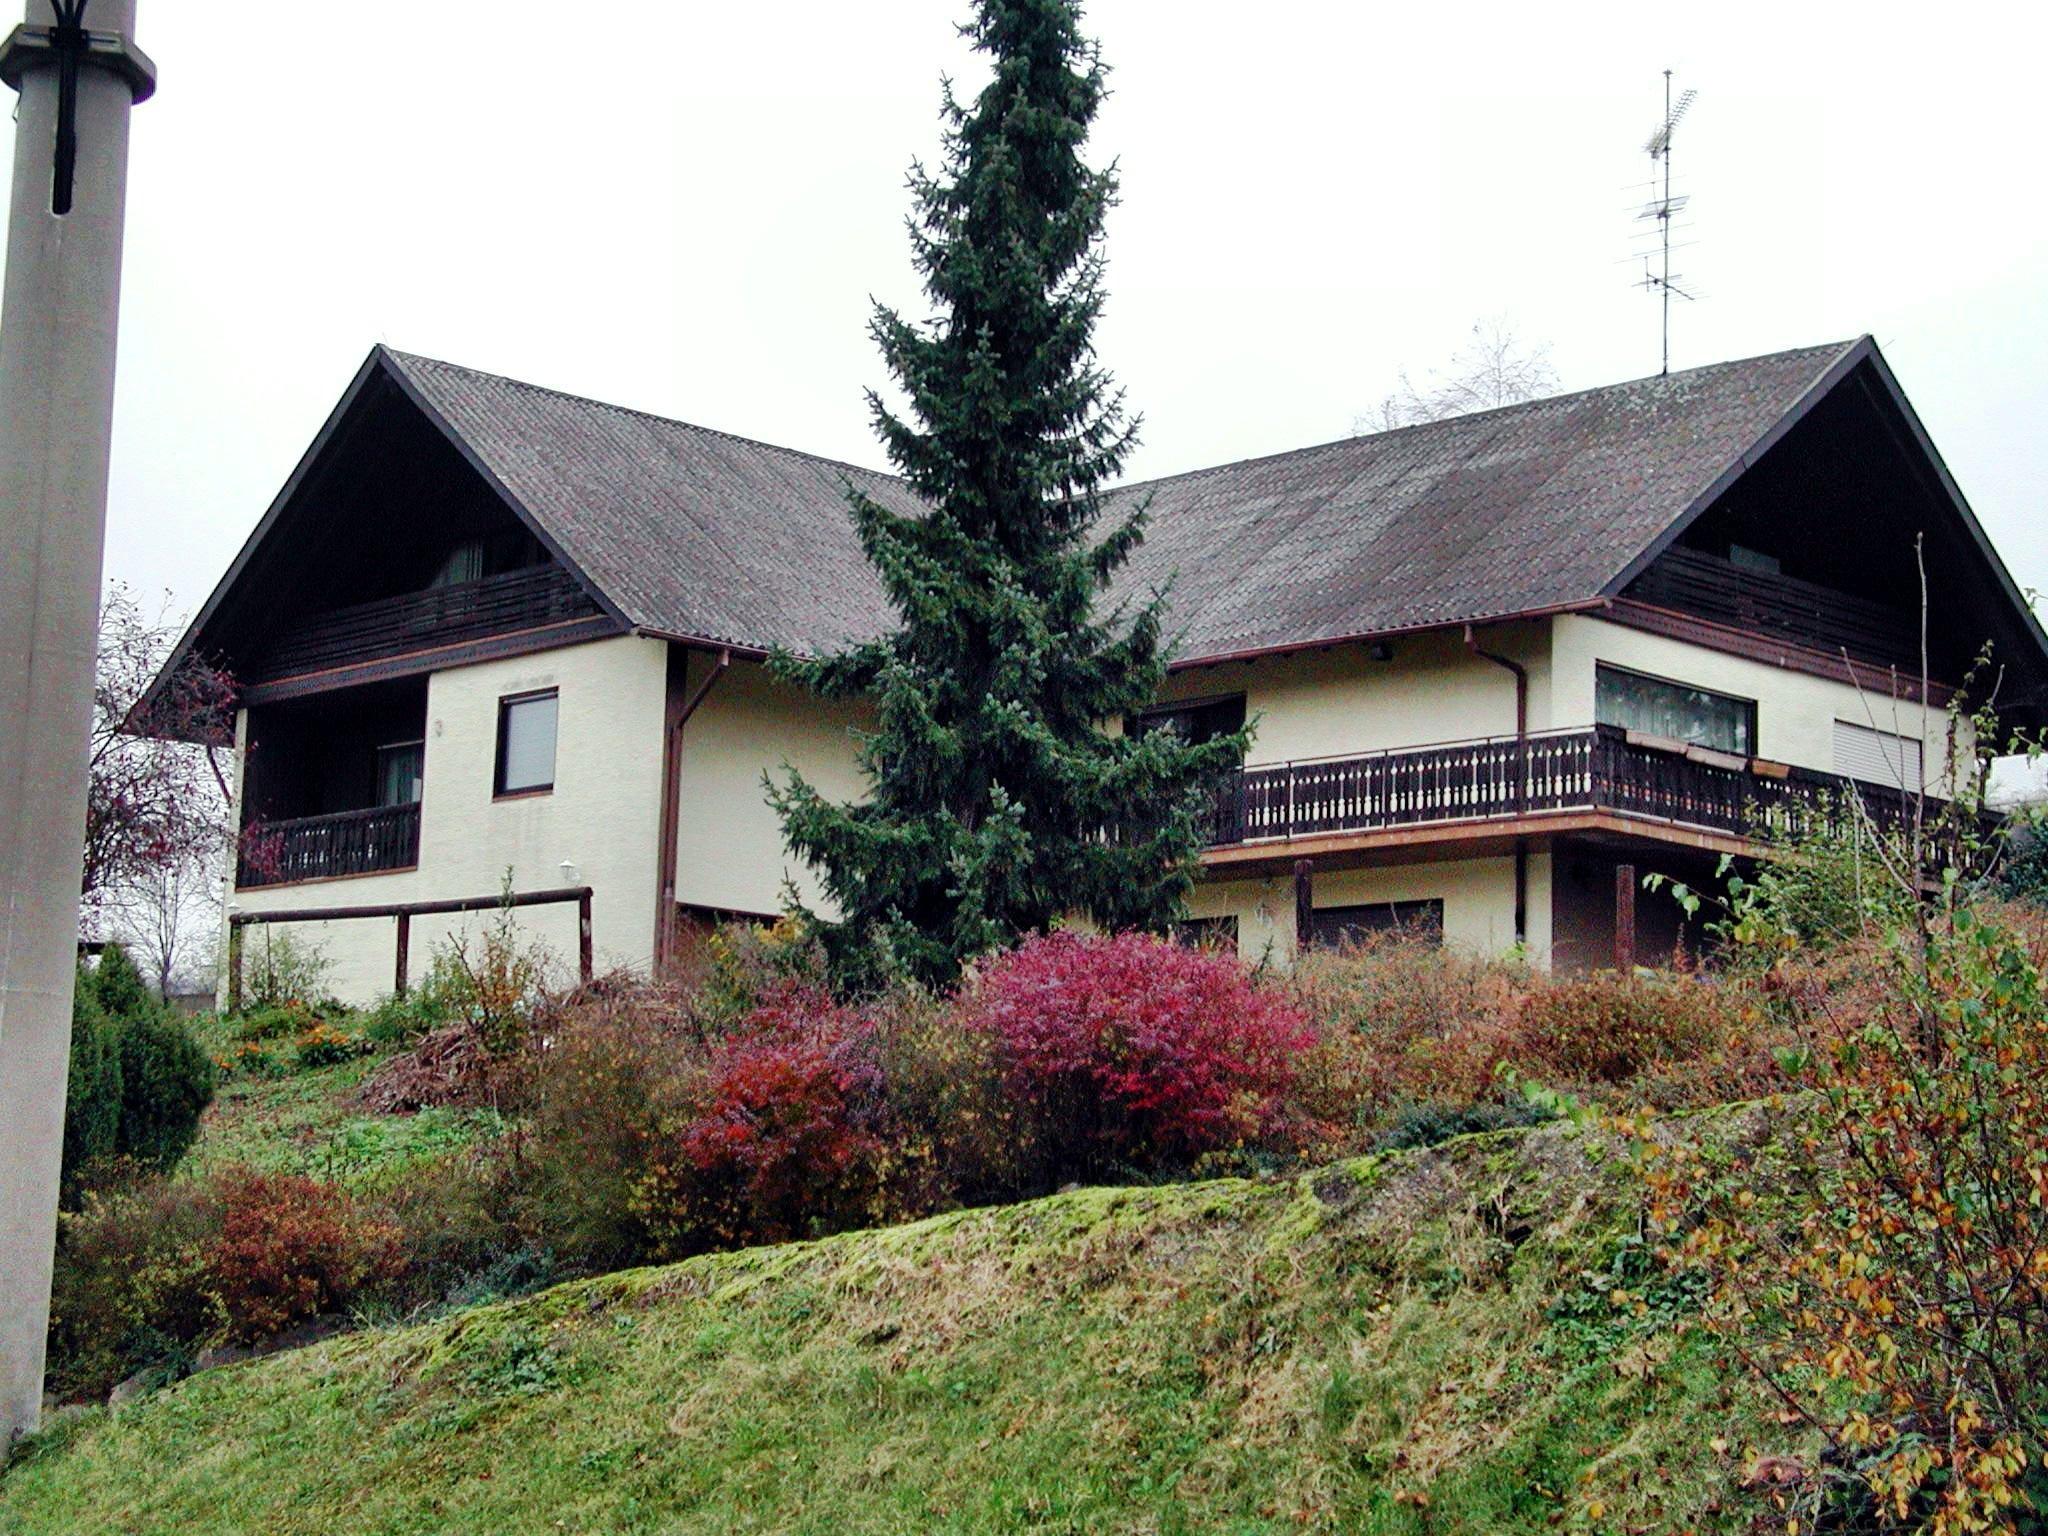 Schellnhausen-3.jpeg